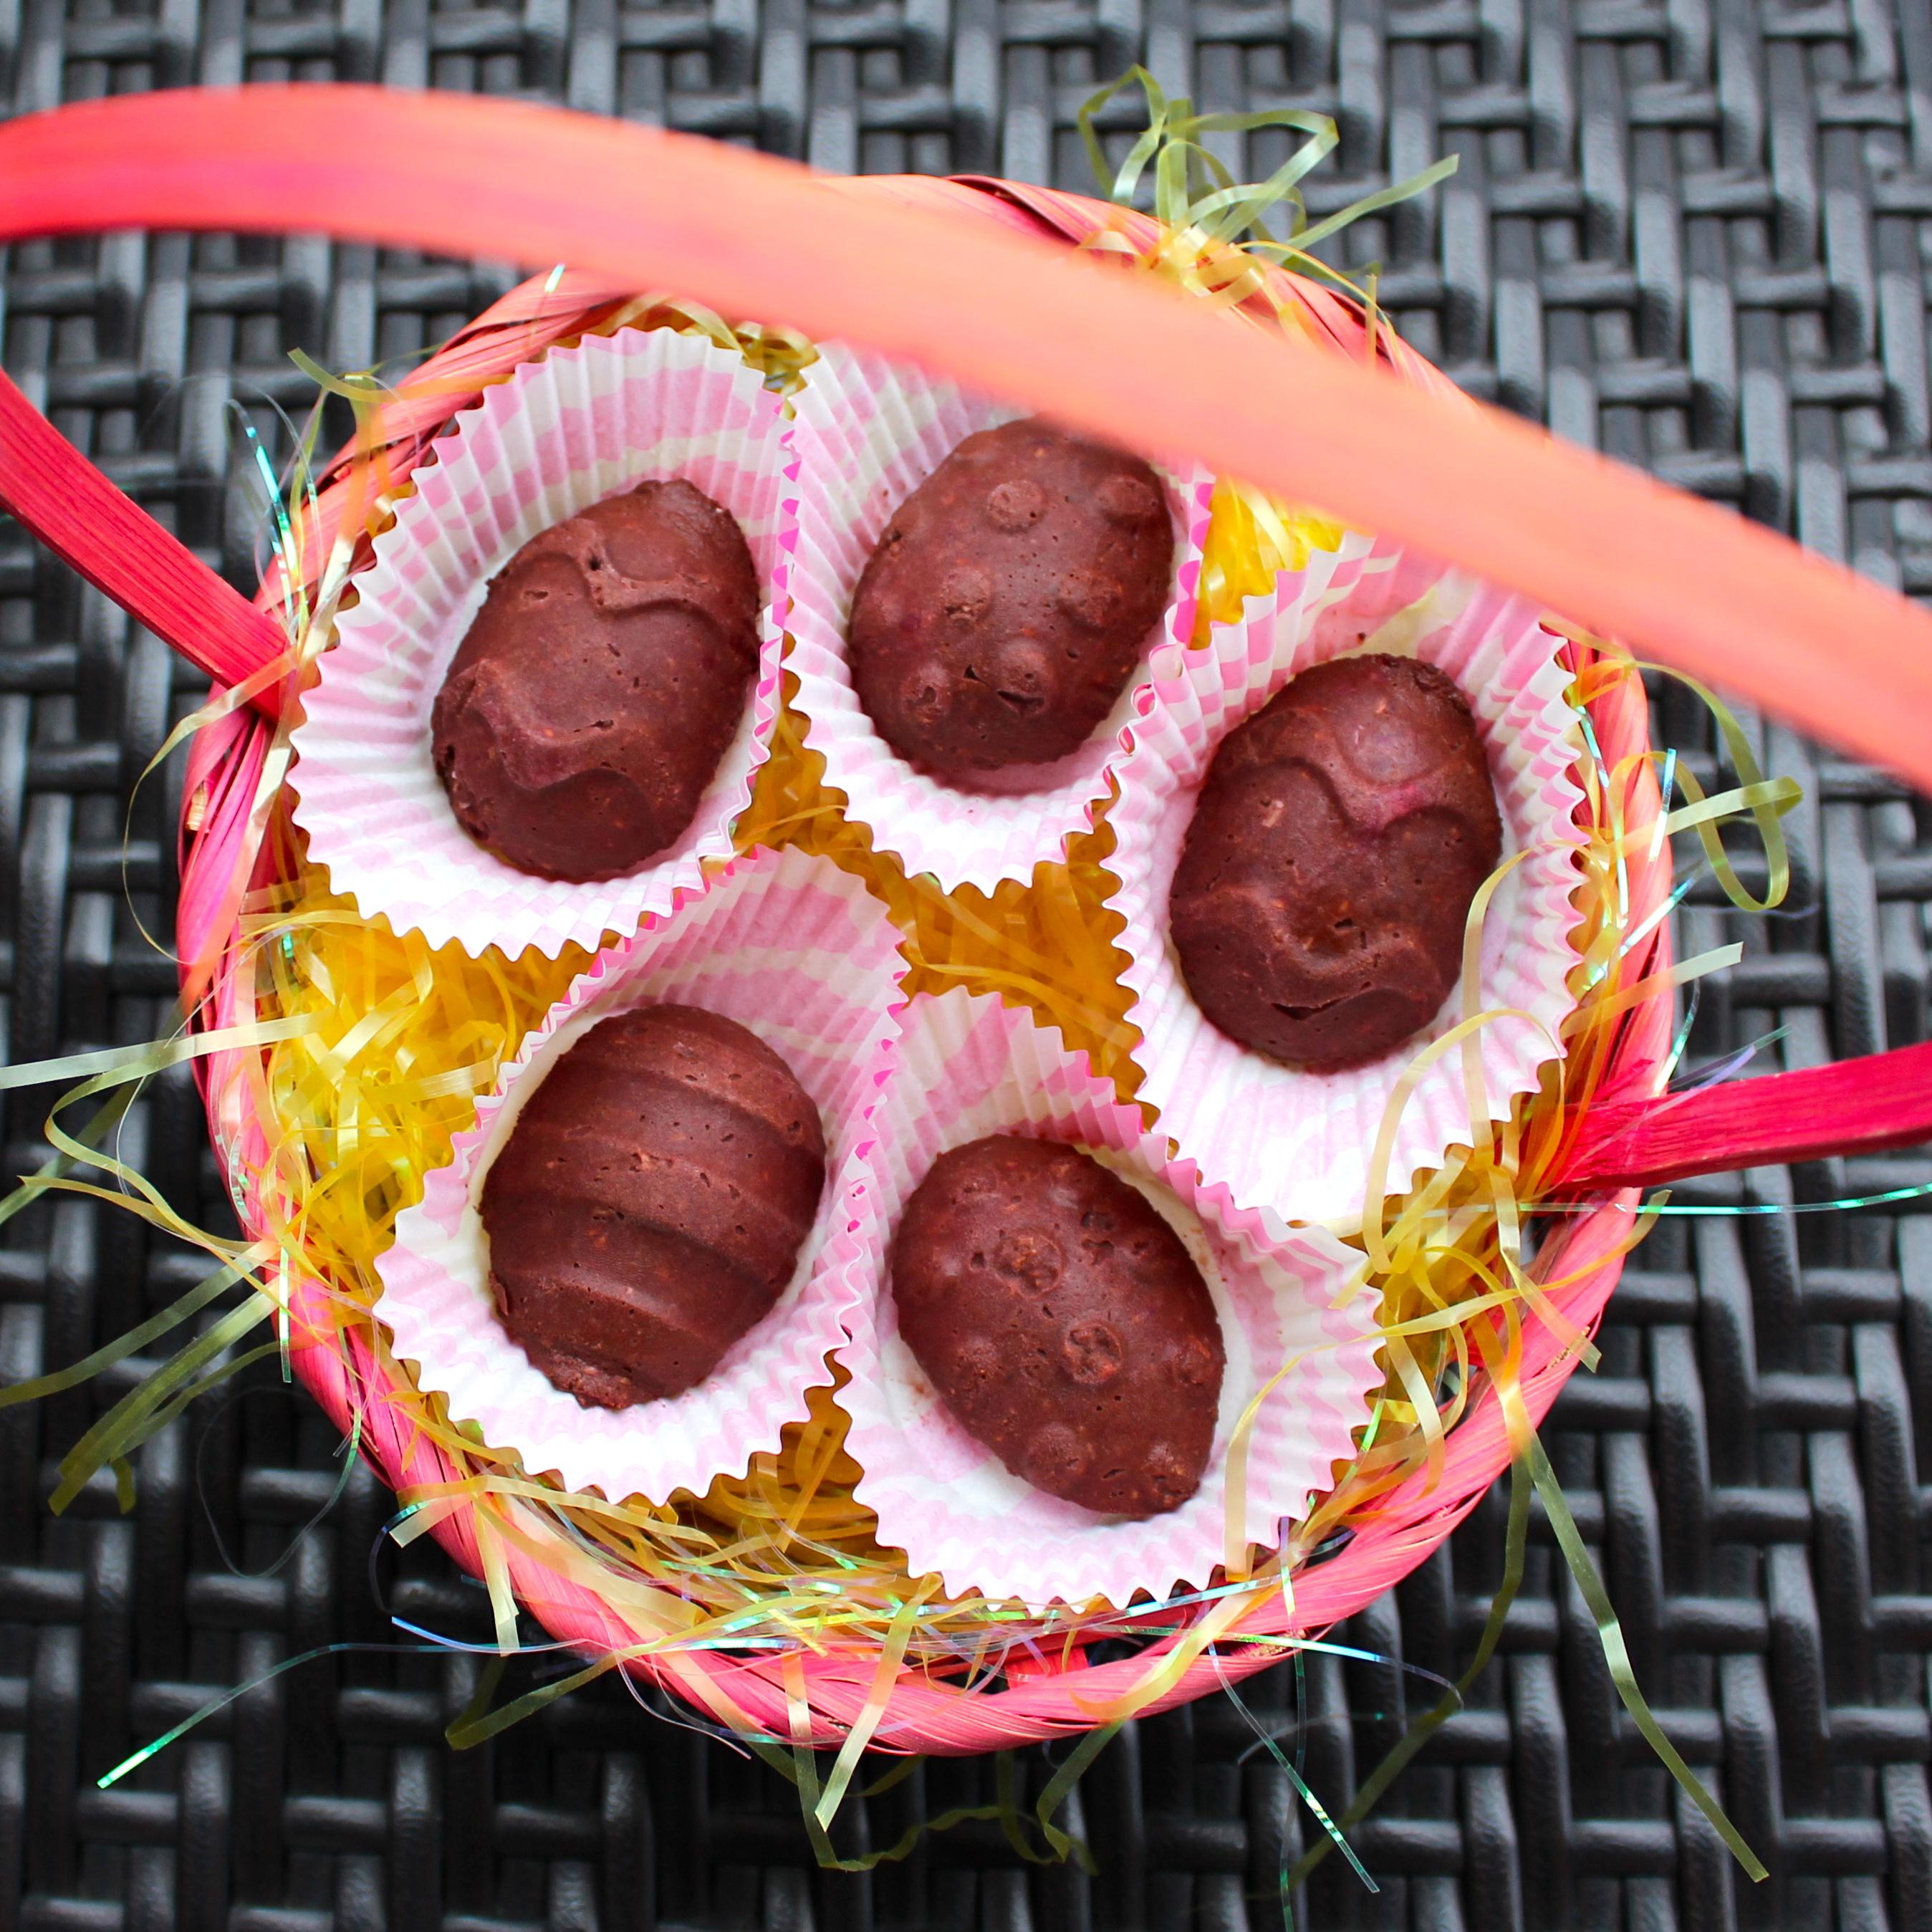 Raspberry Coconut Chocolate Eggs (Dairy-Free)